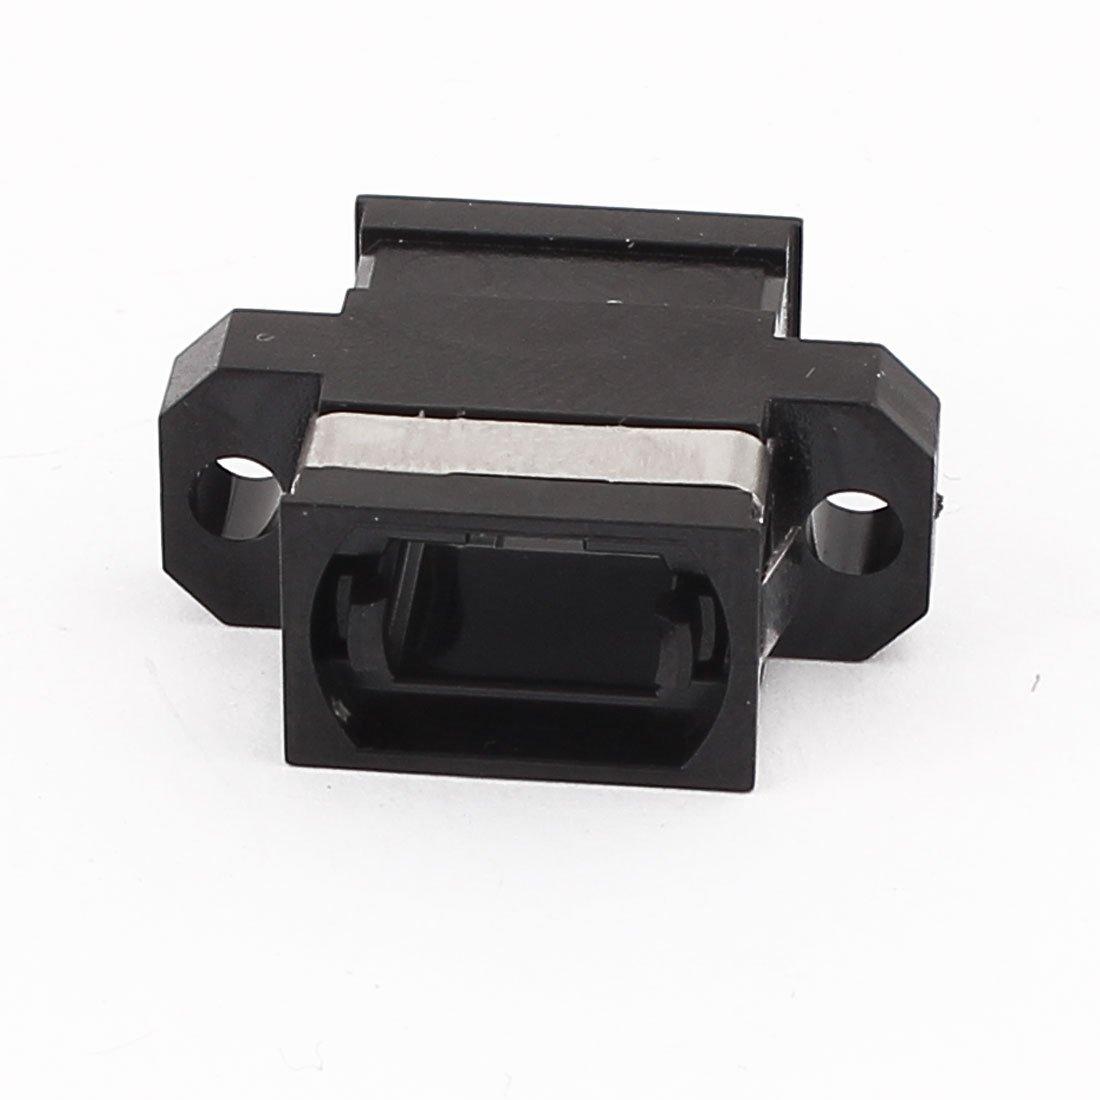 Uxcell Fiber MPO/MTP SM Adapter Optical Fiber Coupler Connector a15111200ux0080